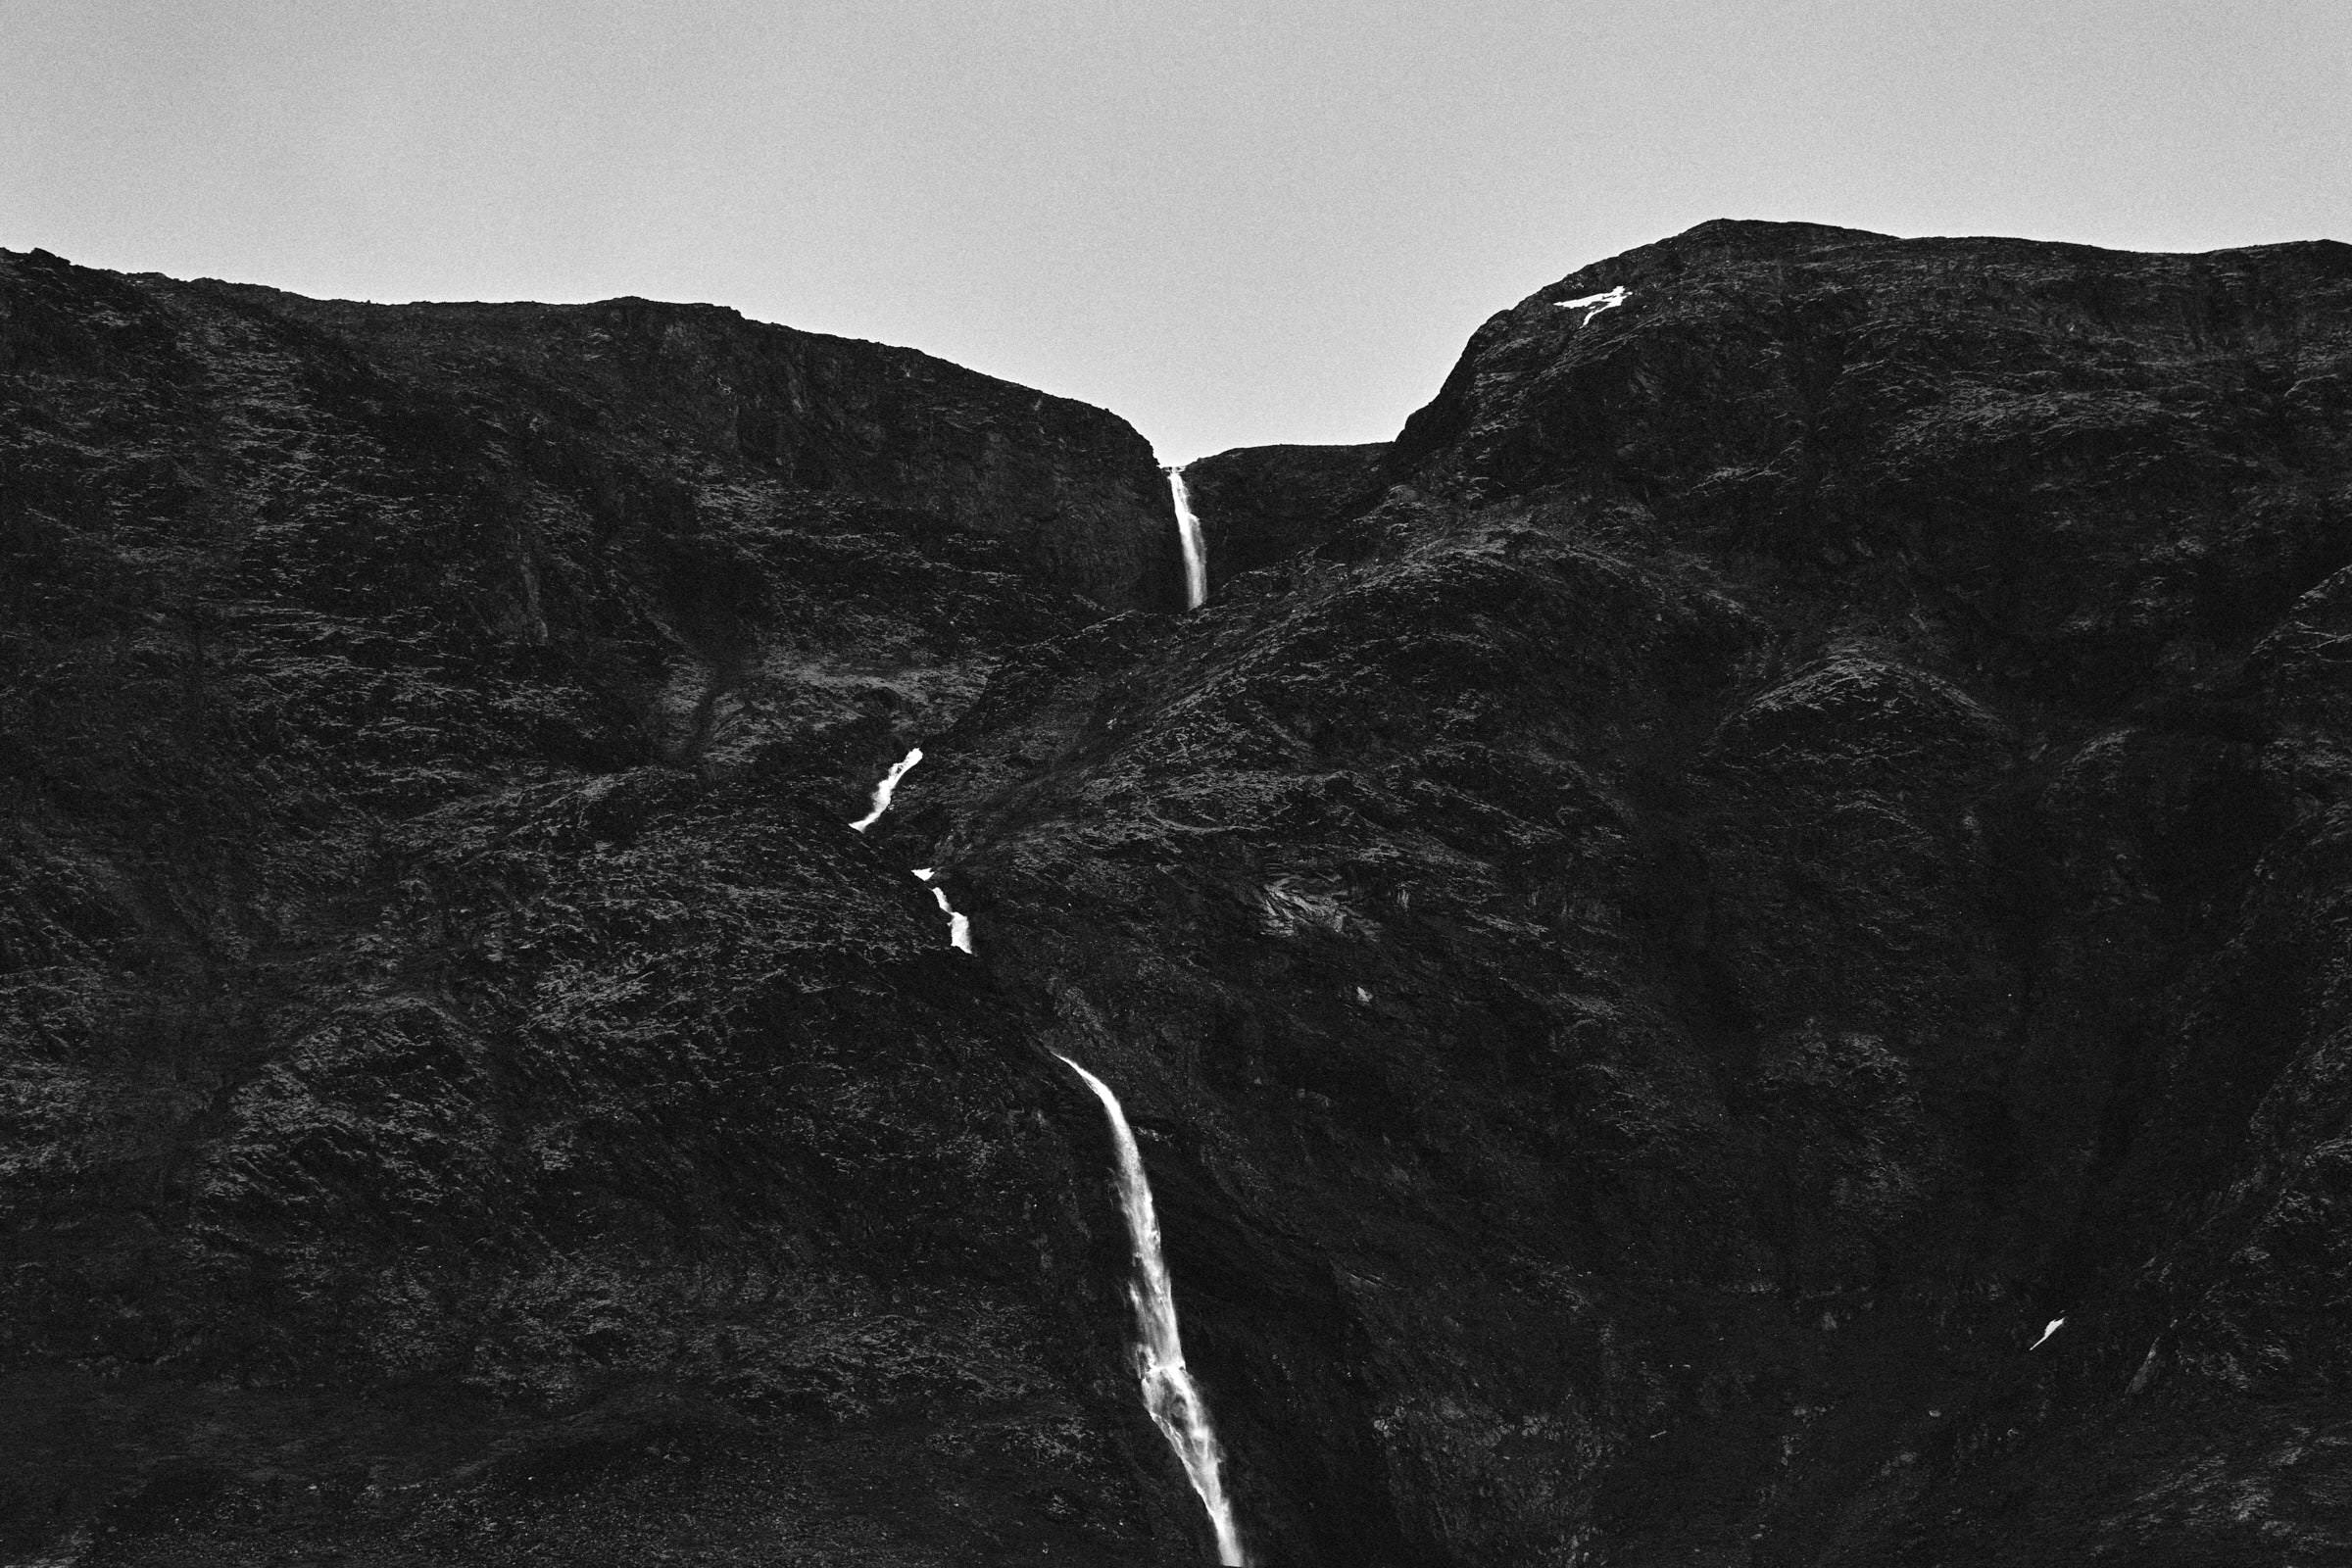 Portfolio_407_Landscape Scandinavian Silence BW DSC4420 1__KRISTOFER SAMUELSSON PHOTOGRAPHY.jpg